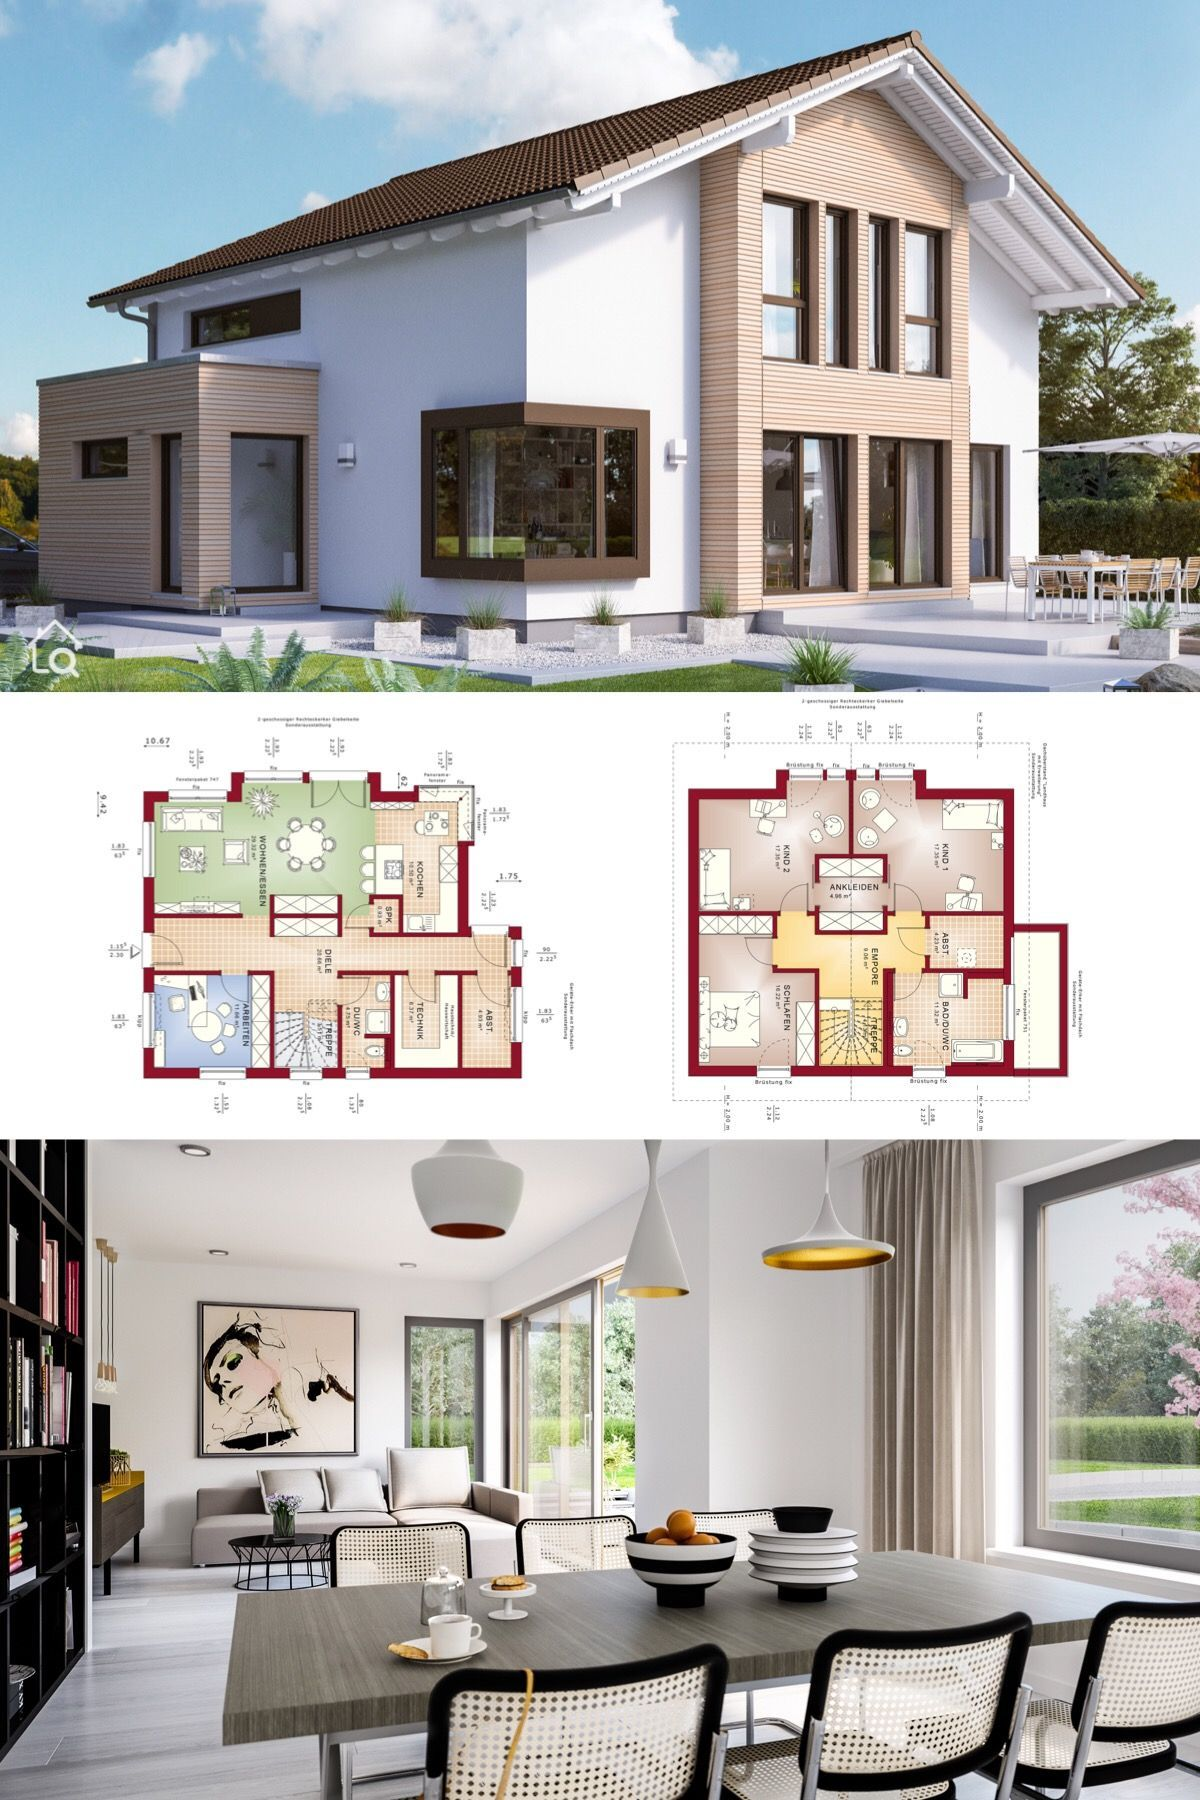 Fertighaus mit Satteldach & Holz Putz Fassade, Grundriss 5